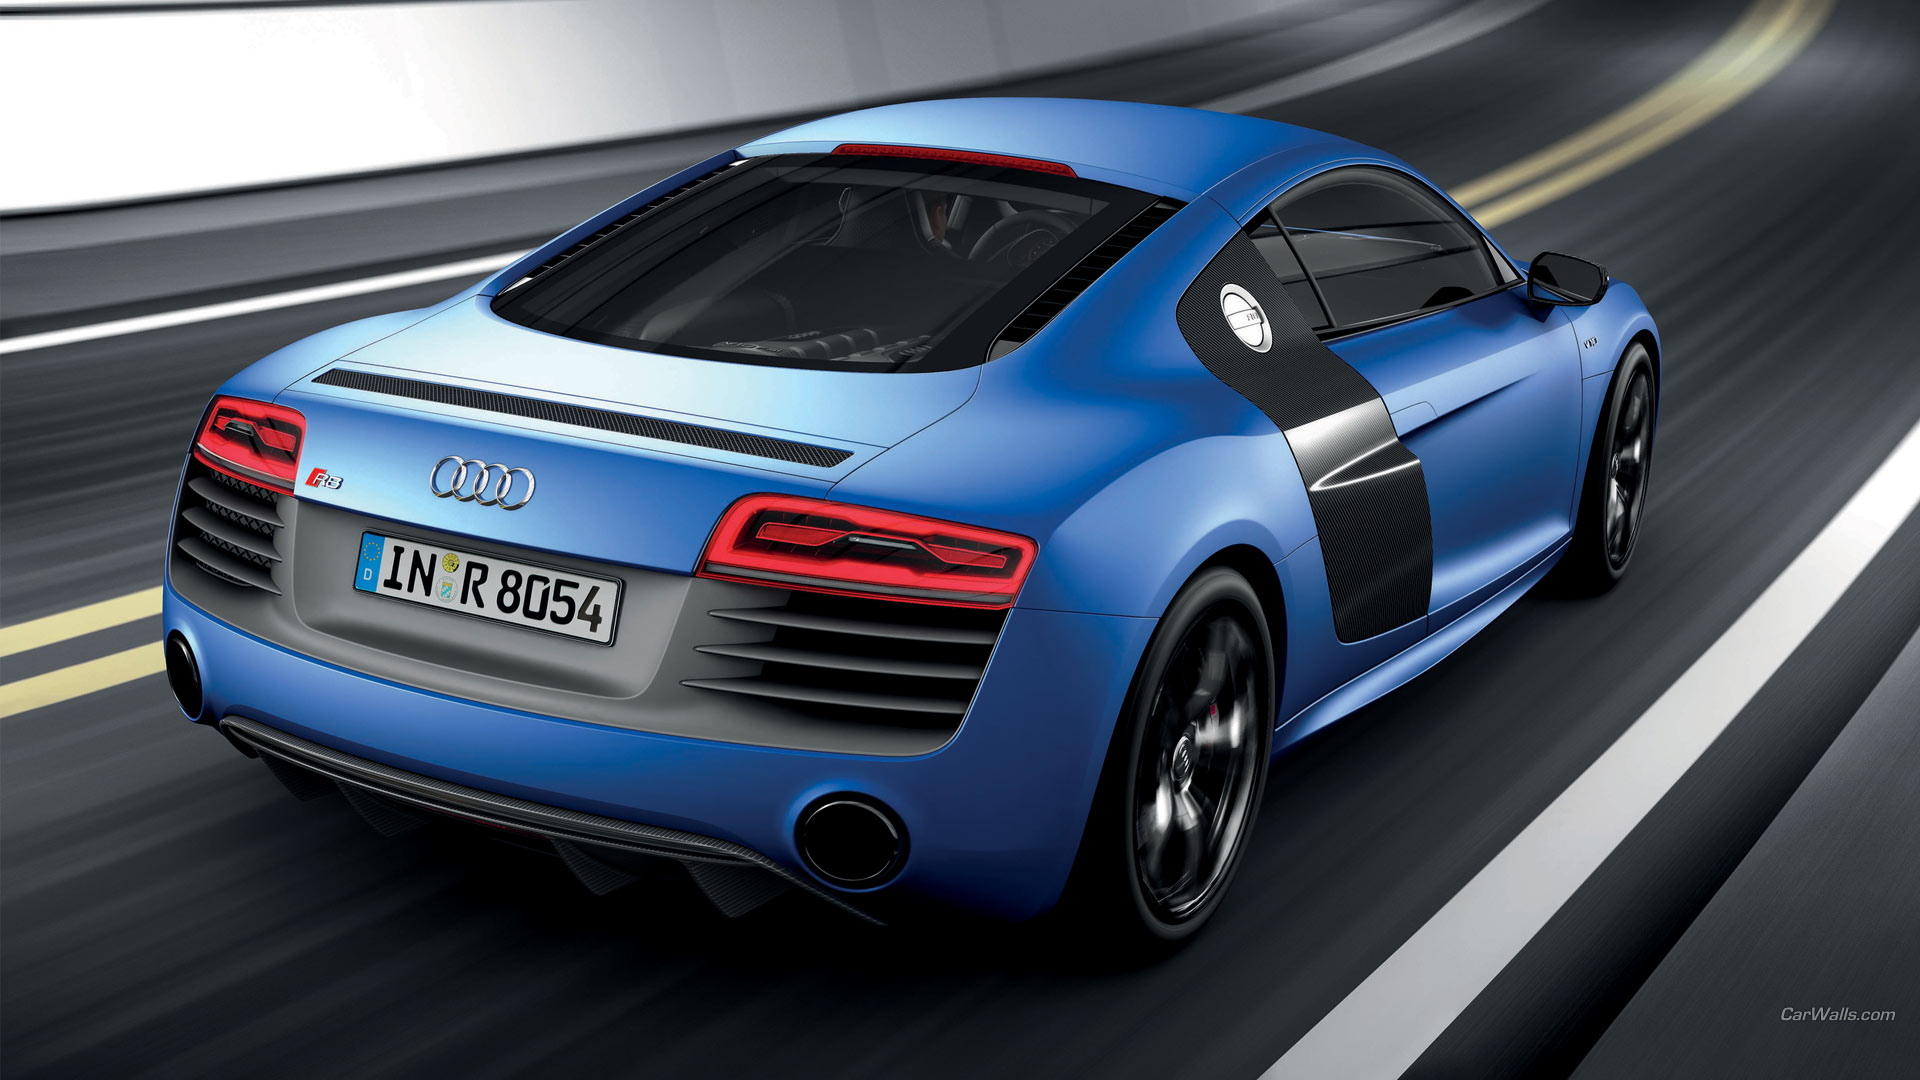 Cool Hd Audi Wallpaper Free Download Hd For